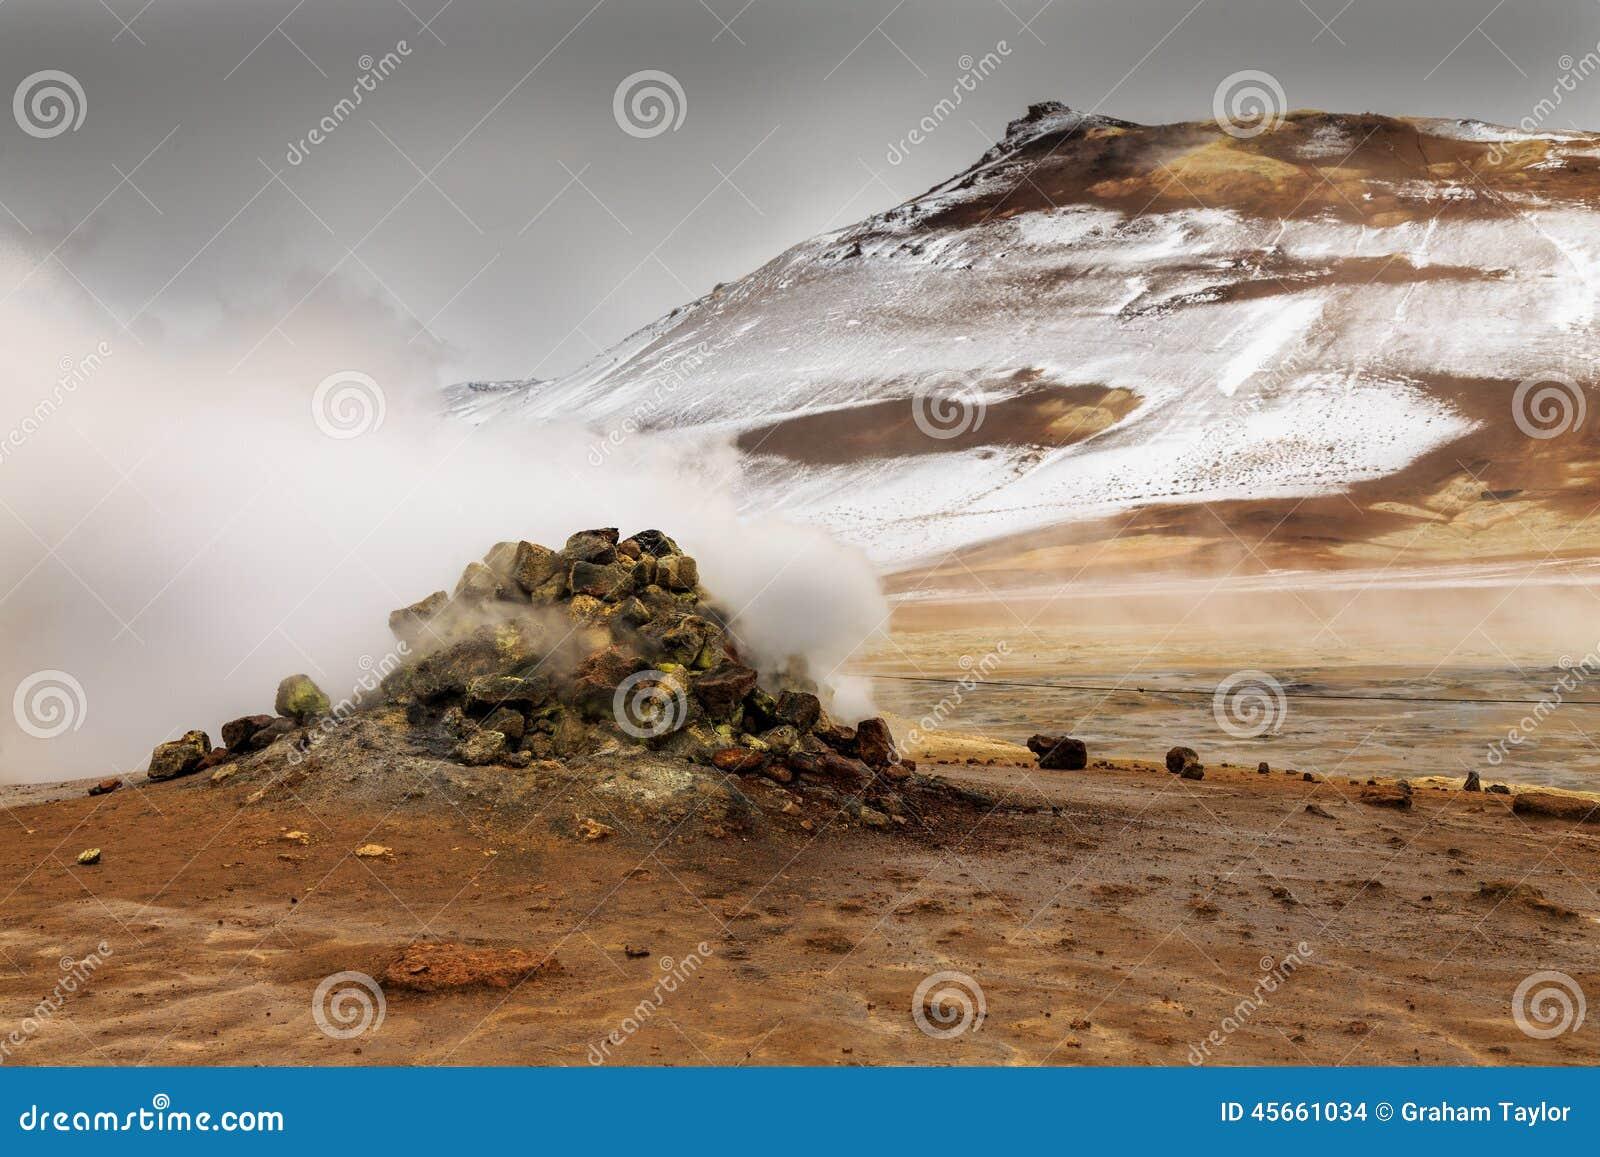 Namaskard geothermisch actief vulkanisch gebied